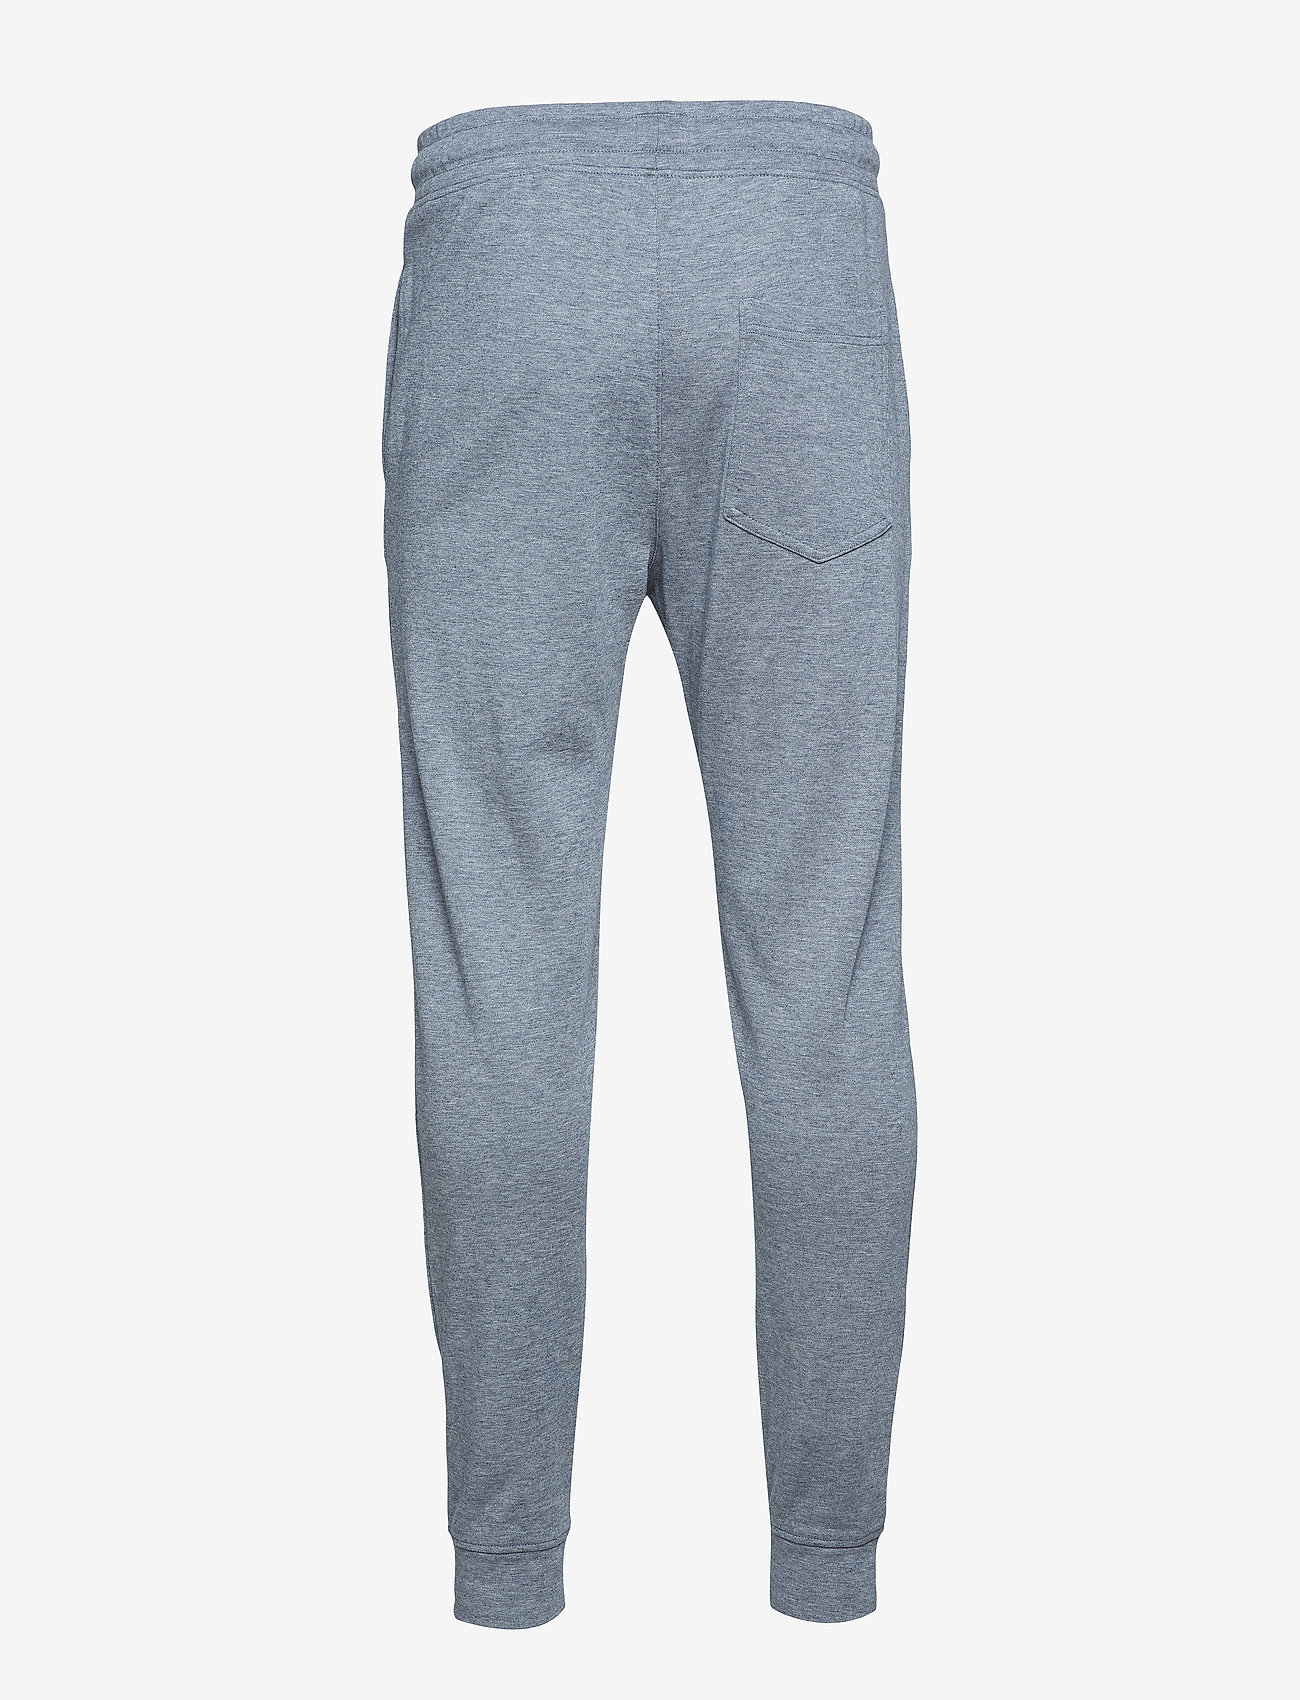 JBS of Denmark - JBS of Denmark, bamboo pants - sweat pants - dark grey